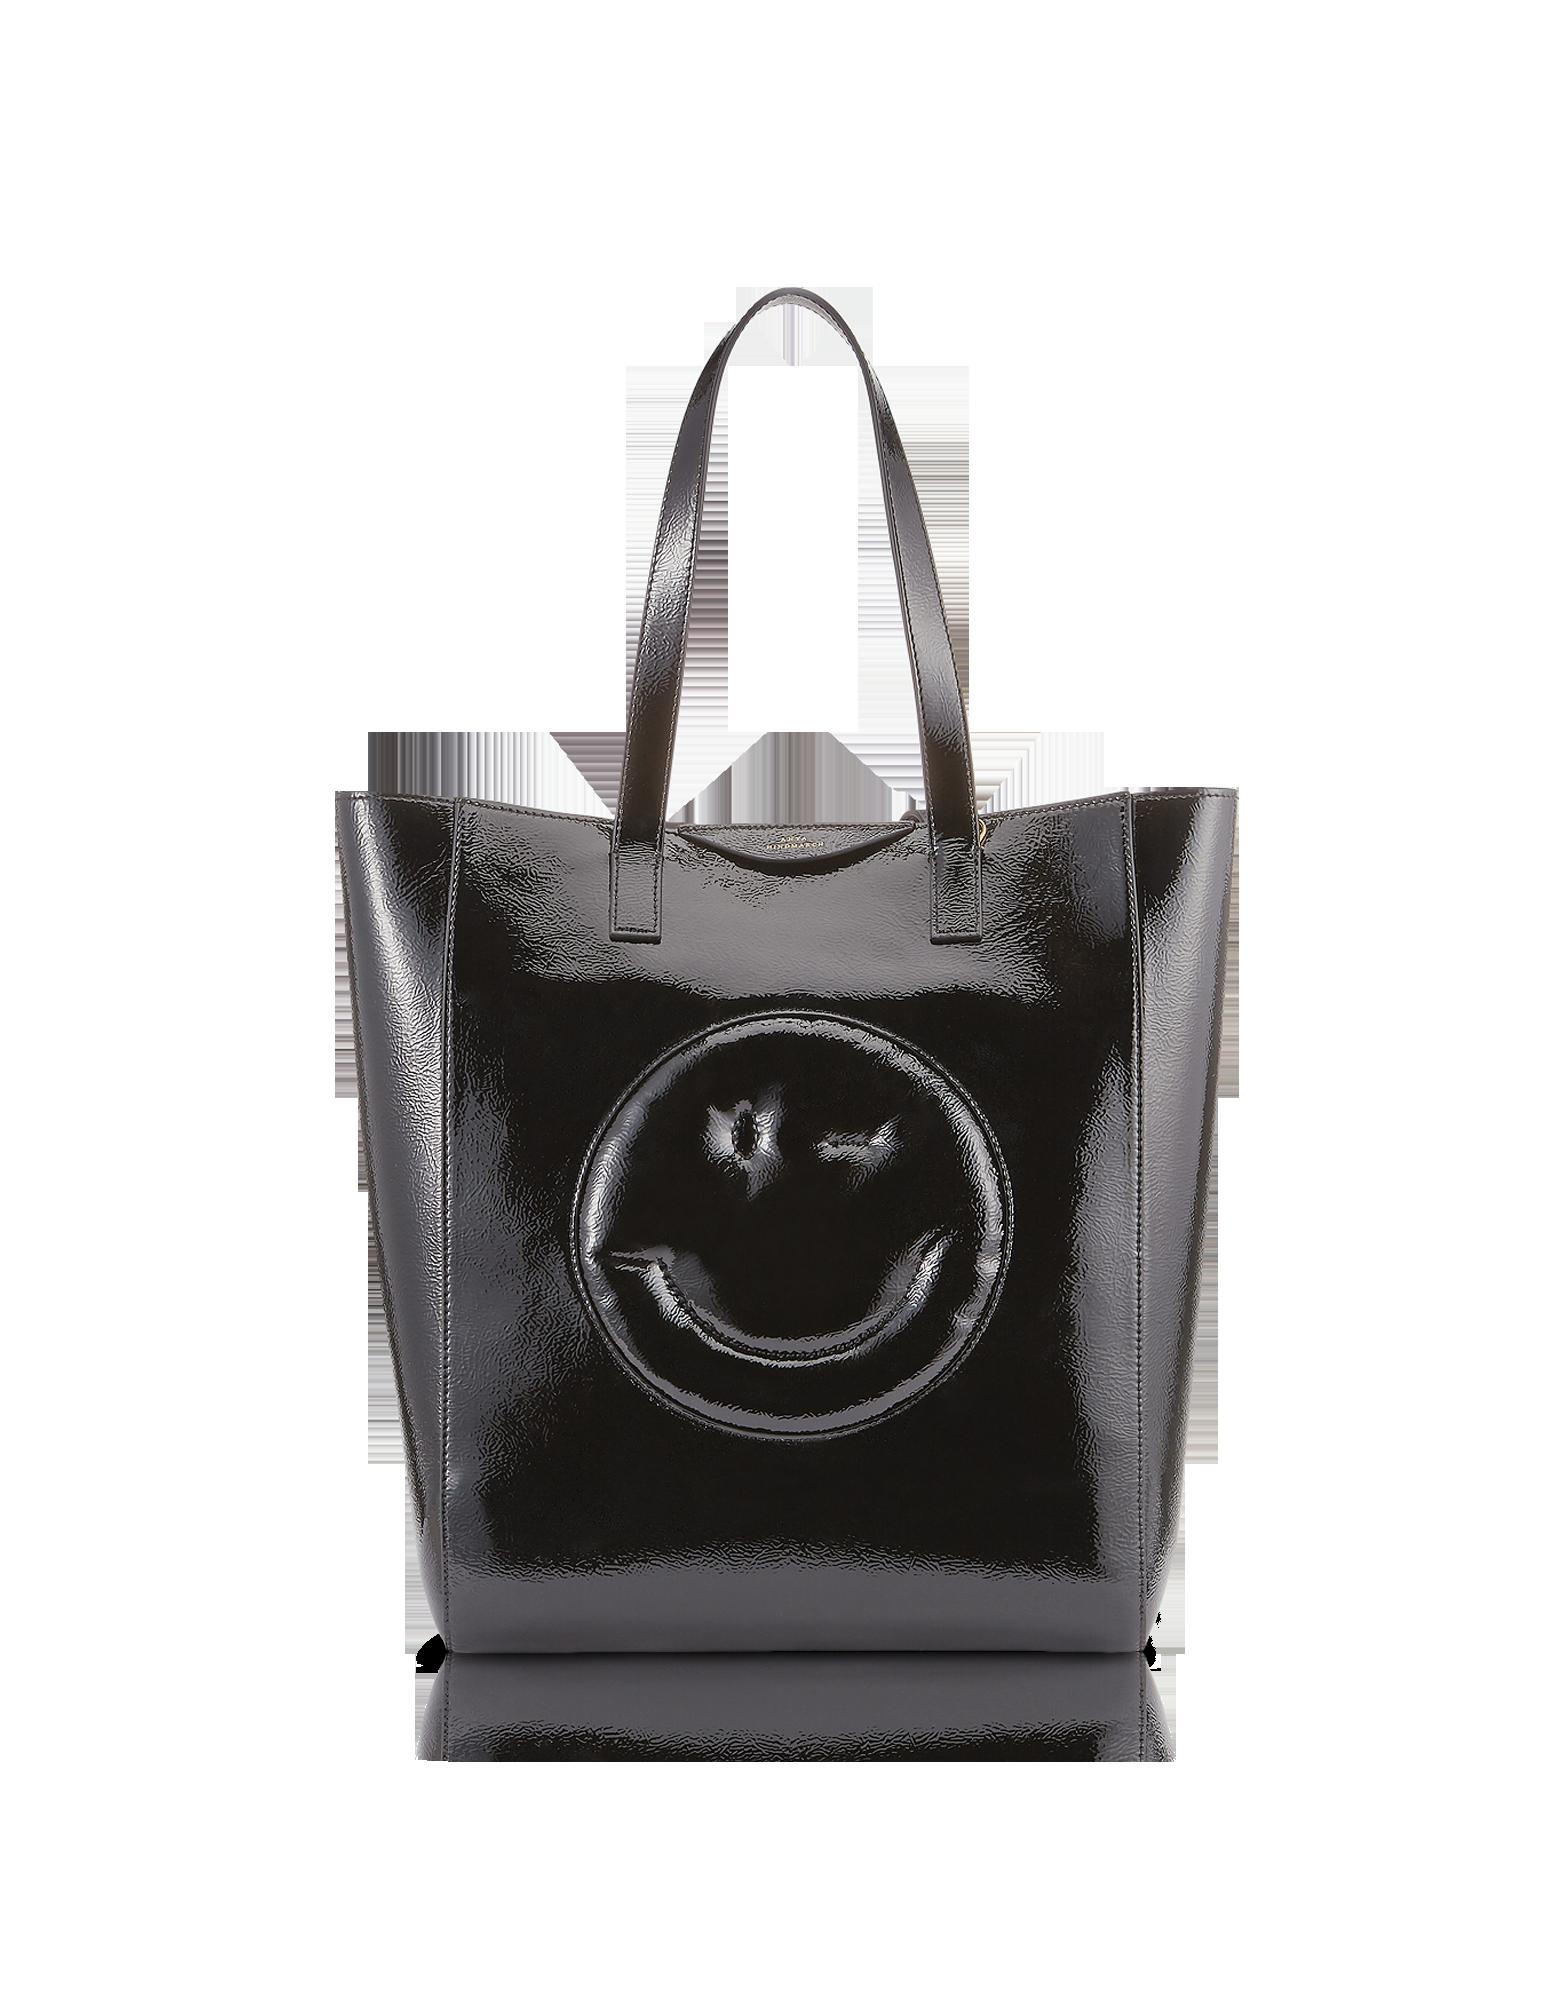 Image of Black Naplak Chubby Wink Tote Bag